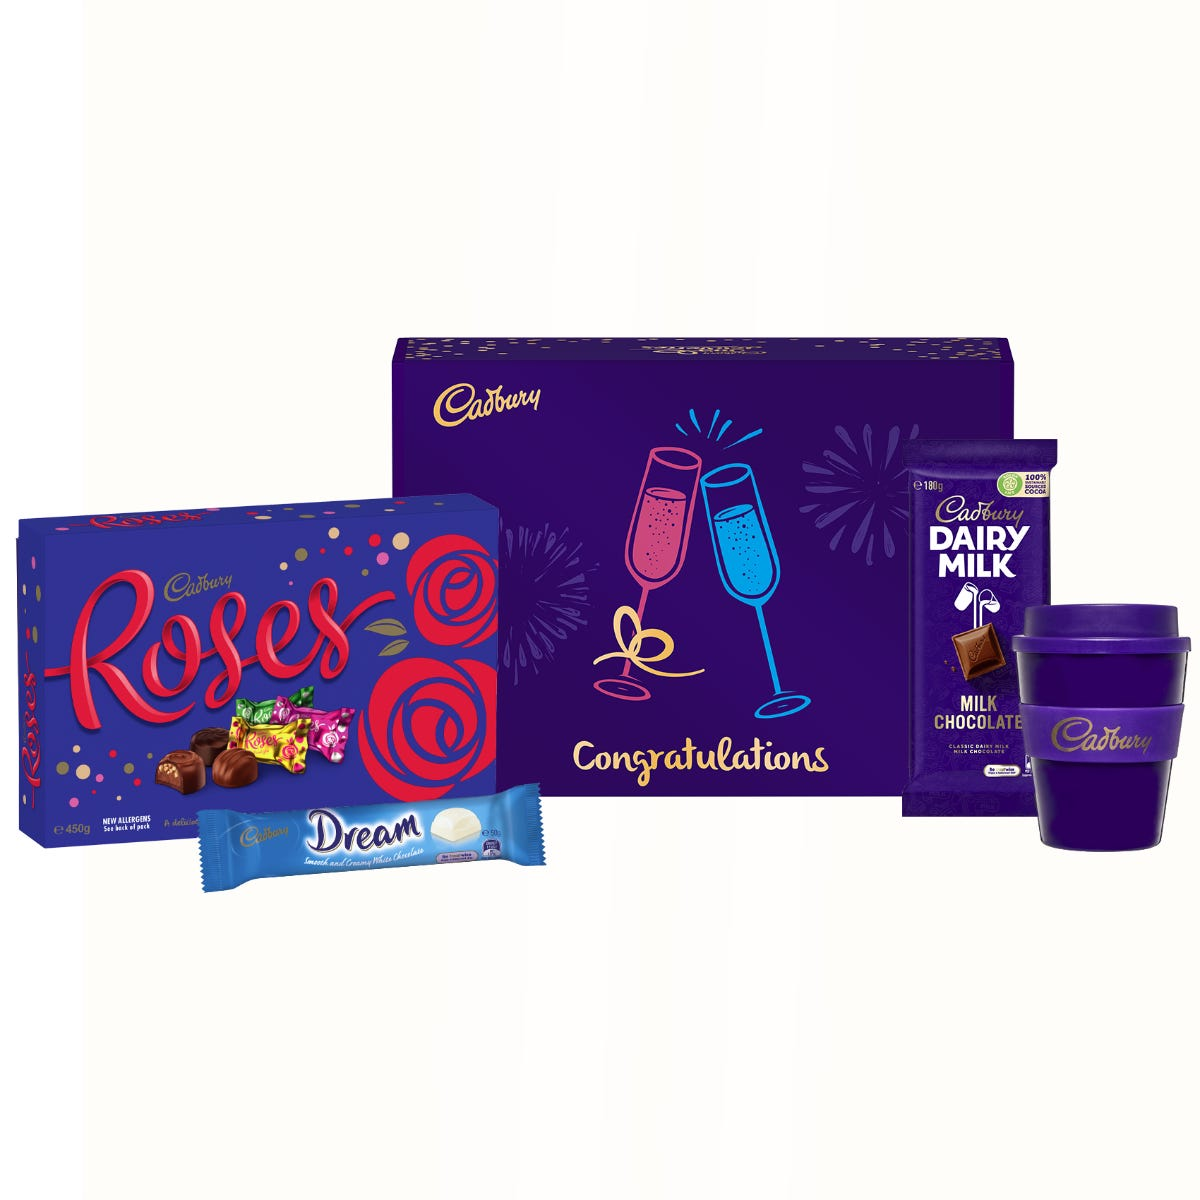 Cadbury Roses gift pack - Congratulations